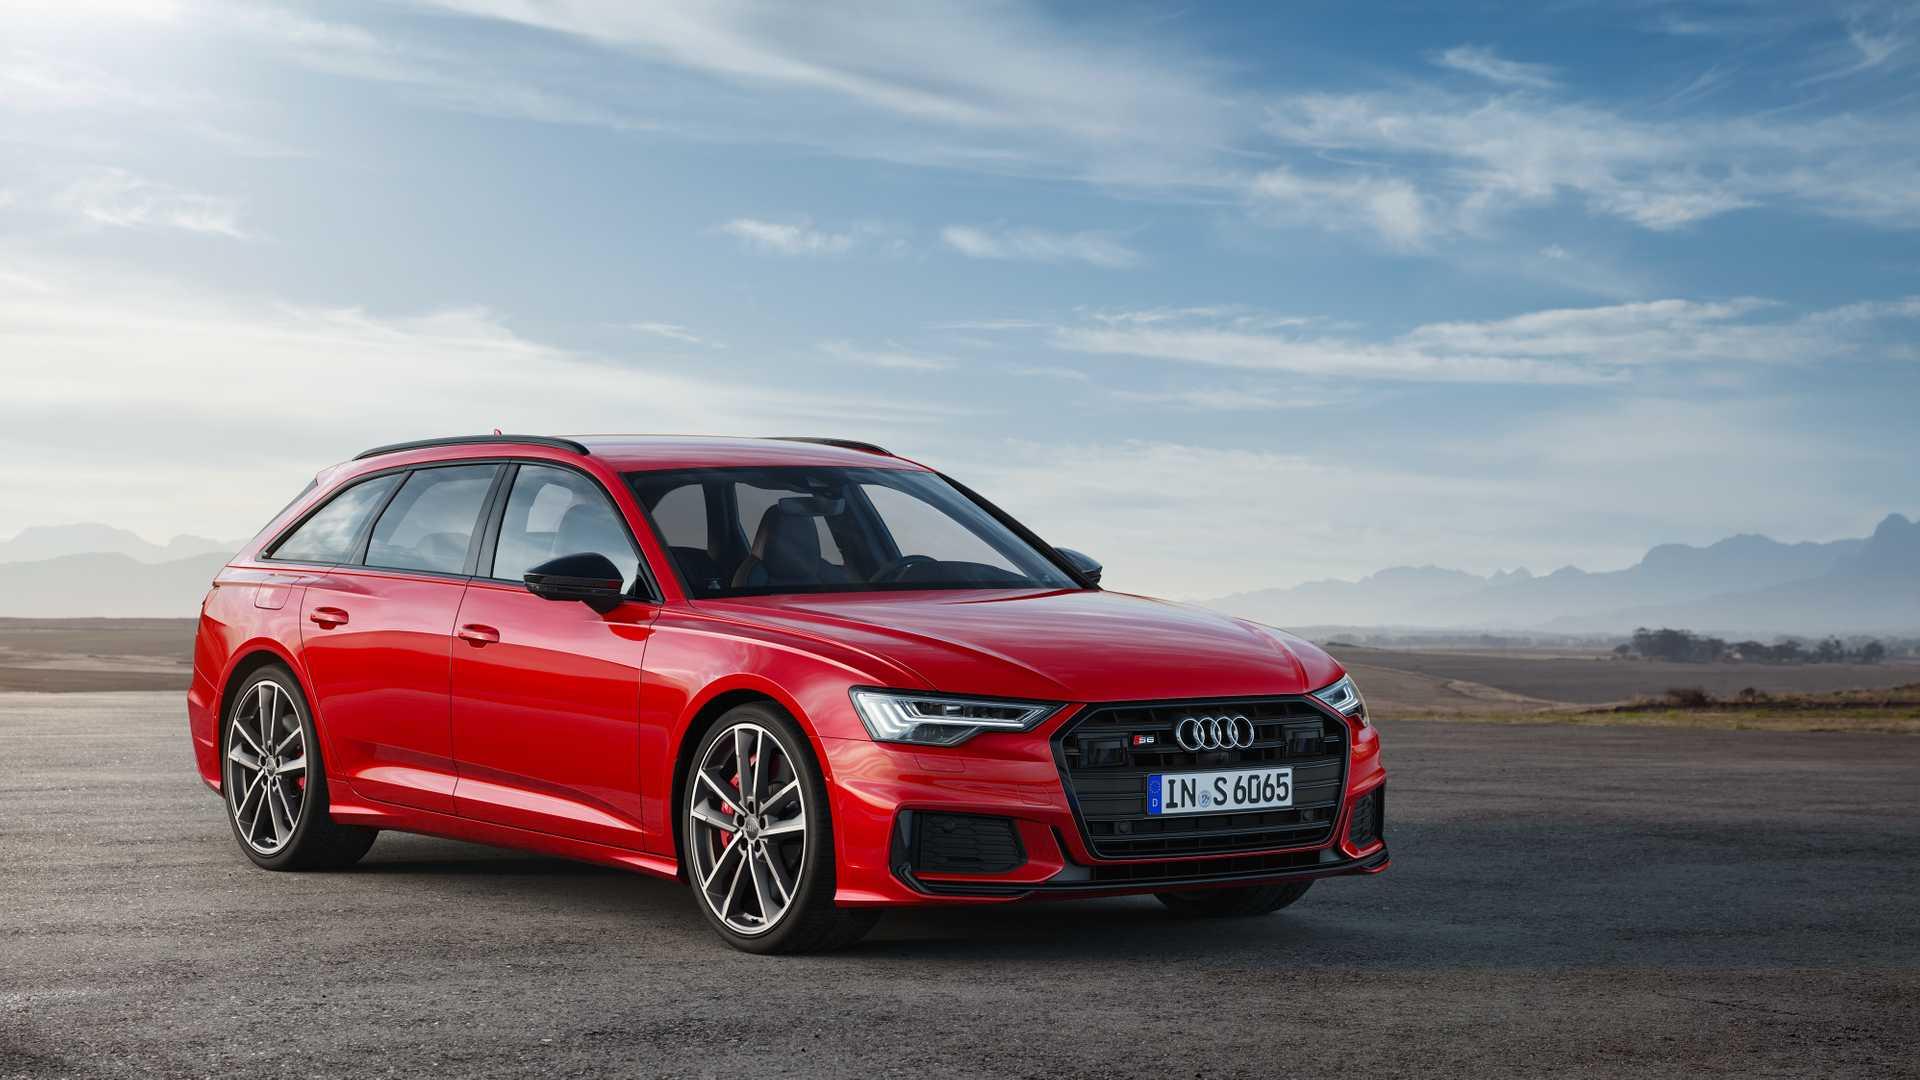 2019 Audi S6 Avant TDI (Color: Tango Red) Front Wallpaper (11)